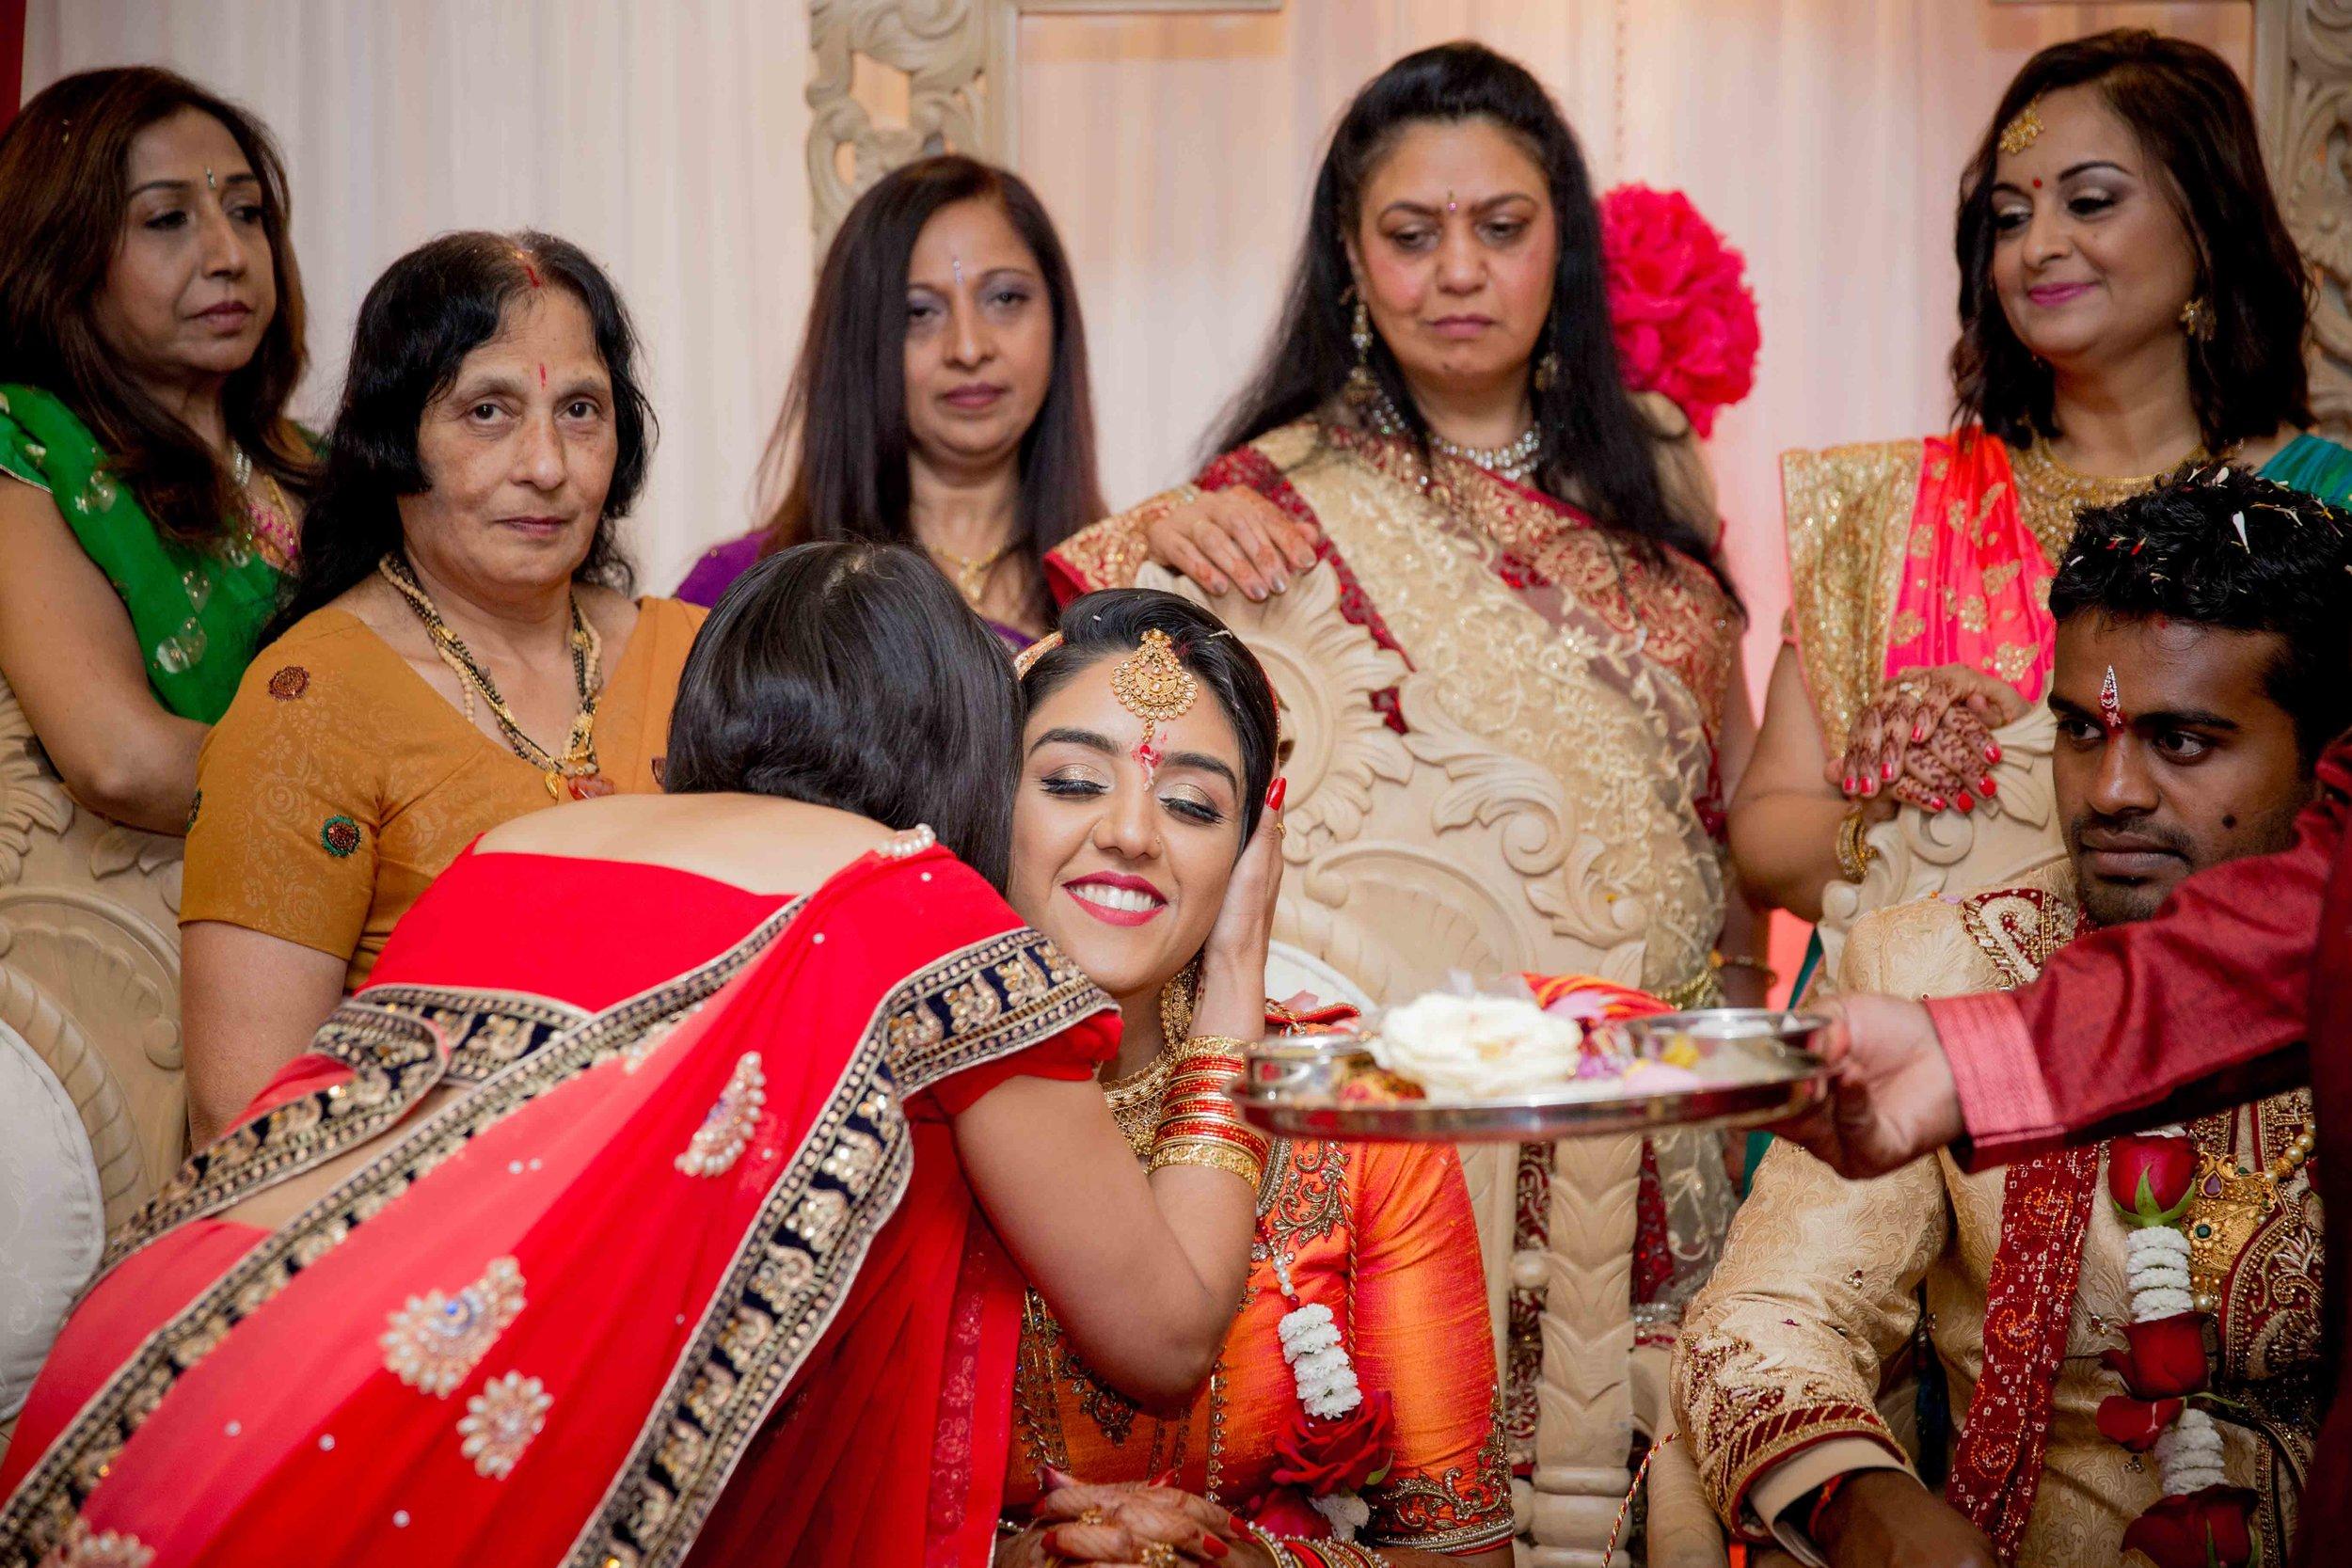 premier-banquetting-london-Hindu-asian-wedding-photographer-natalia-smith-photography-31.jpg